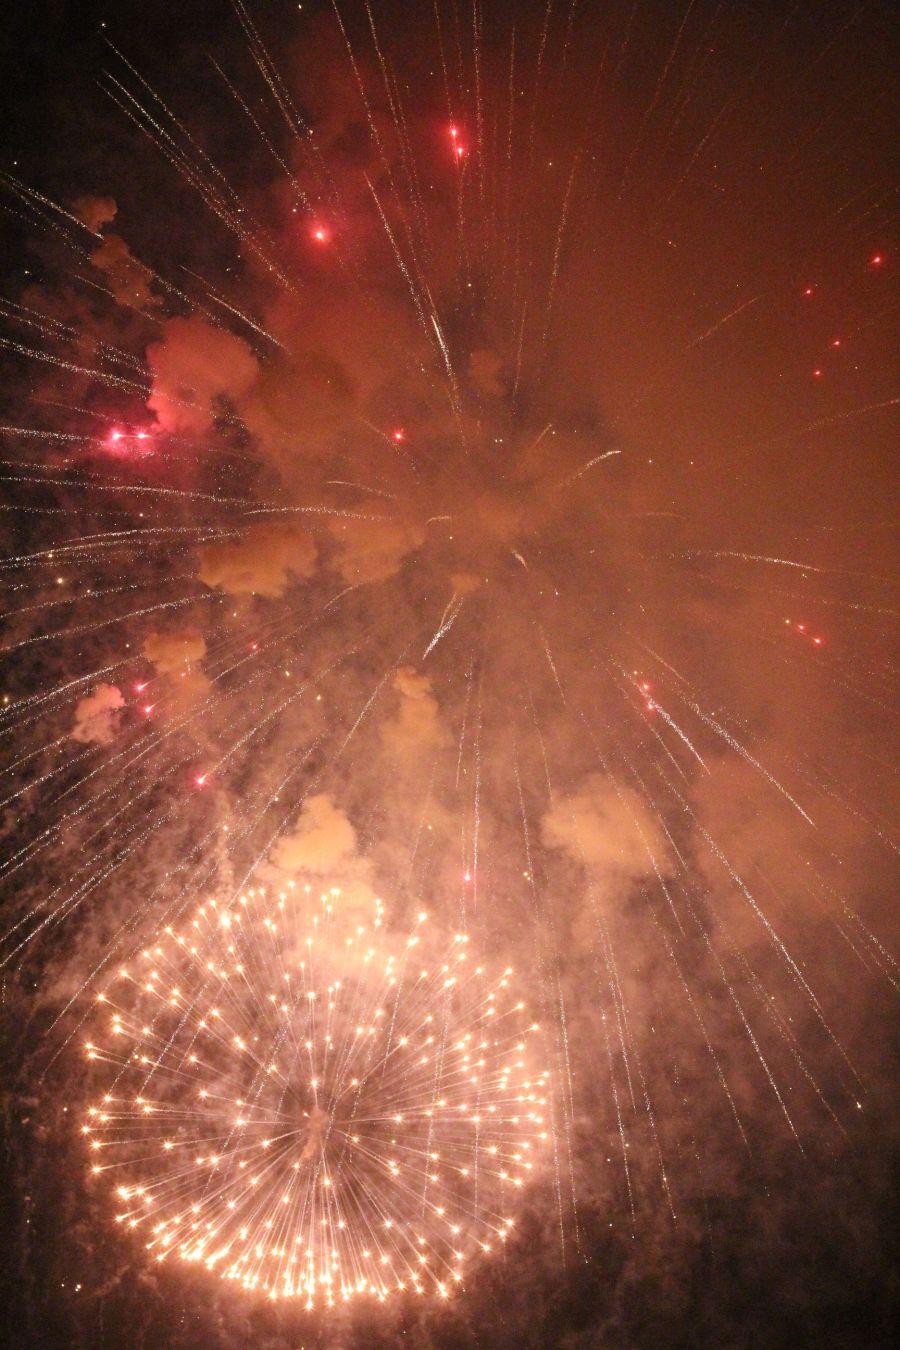 cambridge charles river fireworks 24